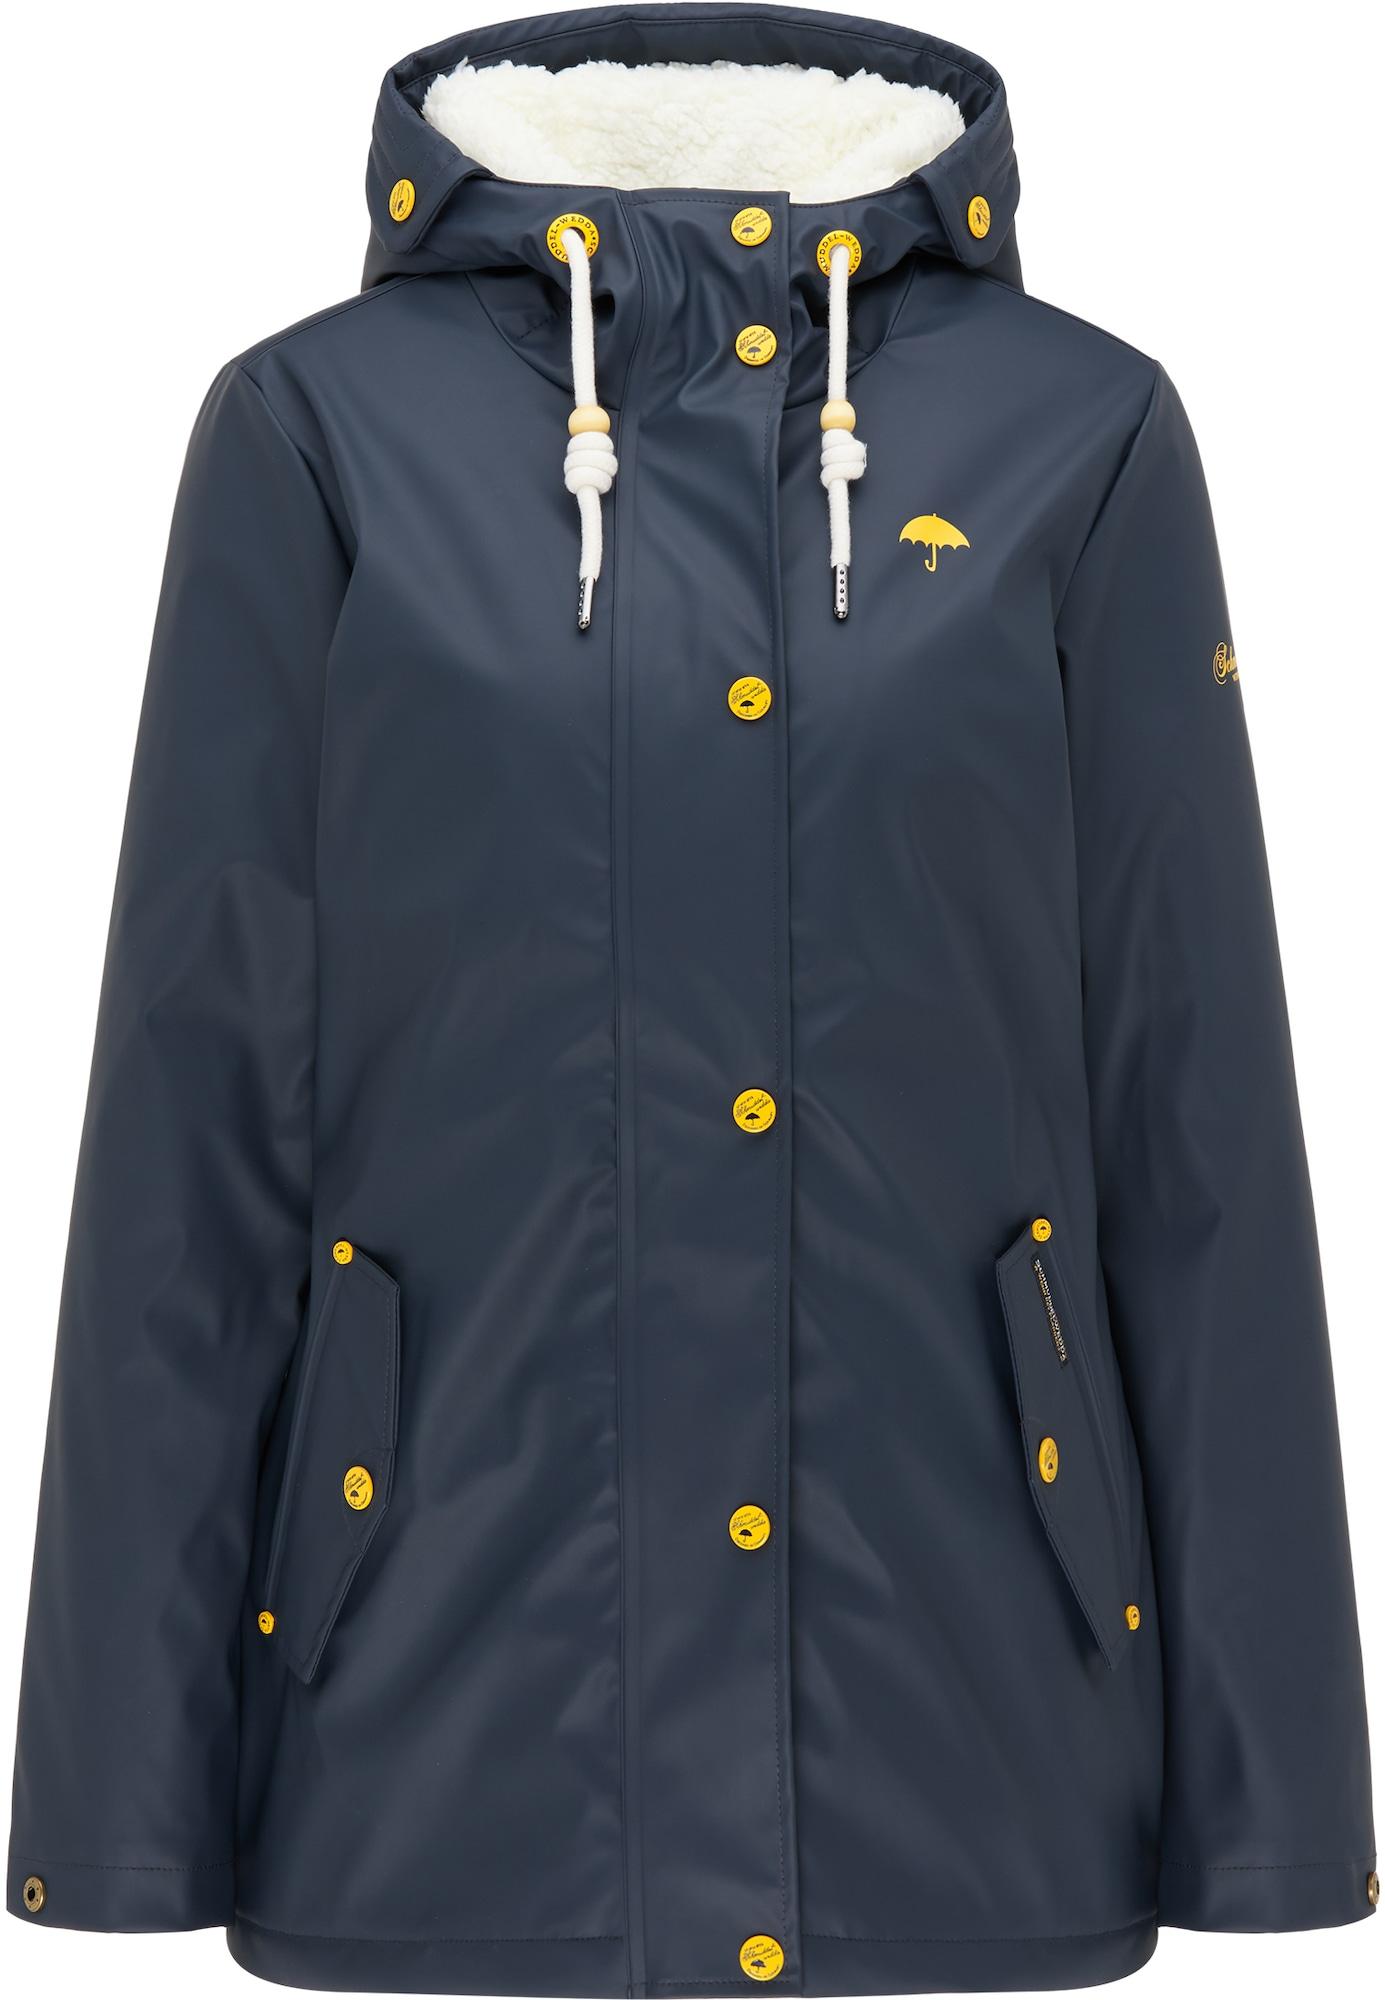 Schmuddelwedda Demisezoninė striukė kobalto mėlyna / geltona